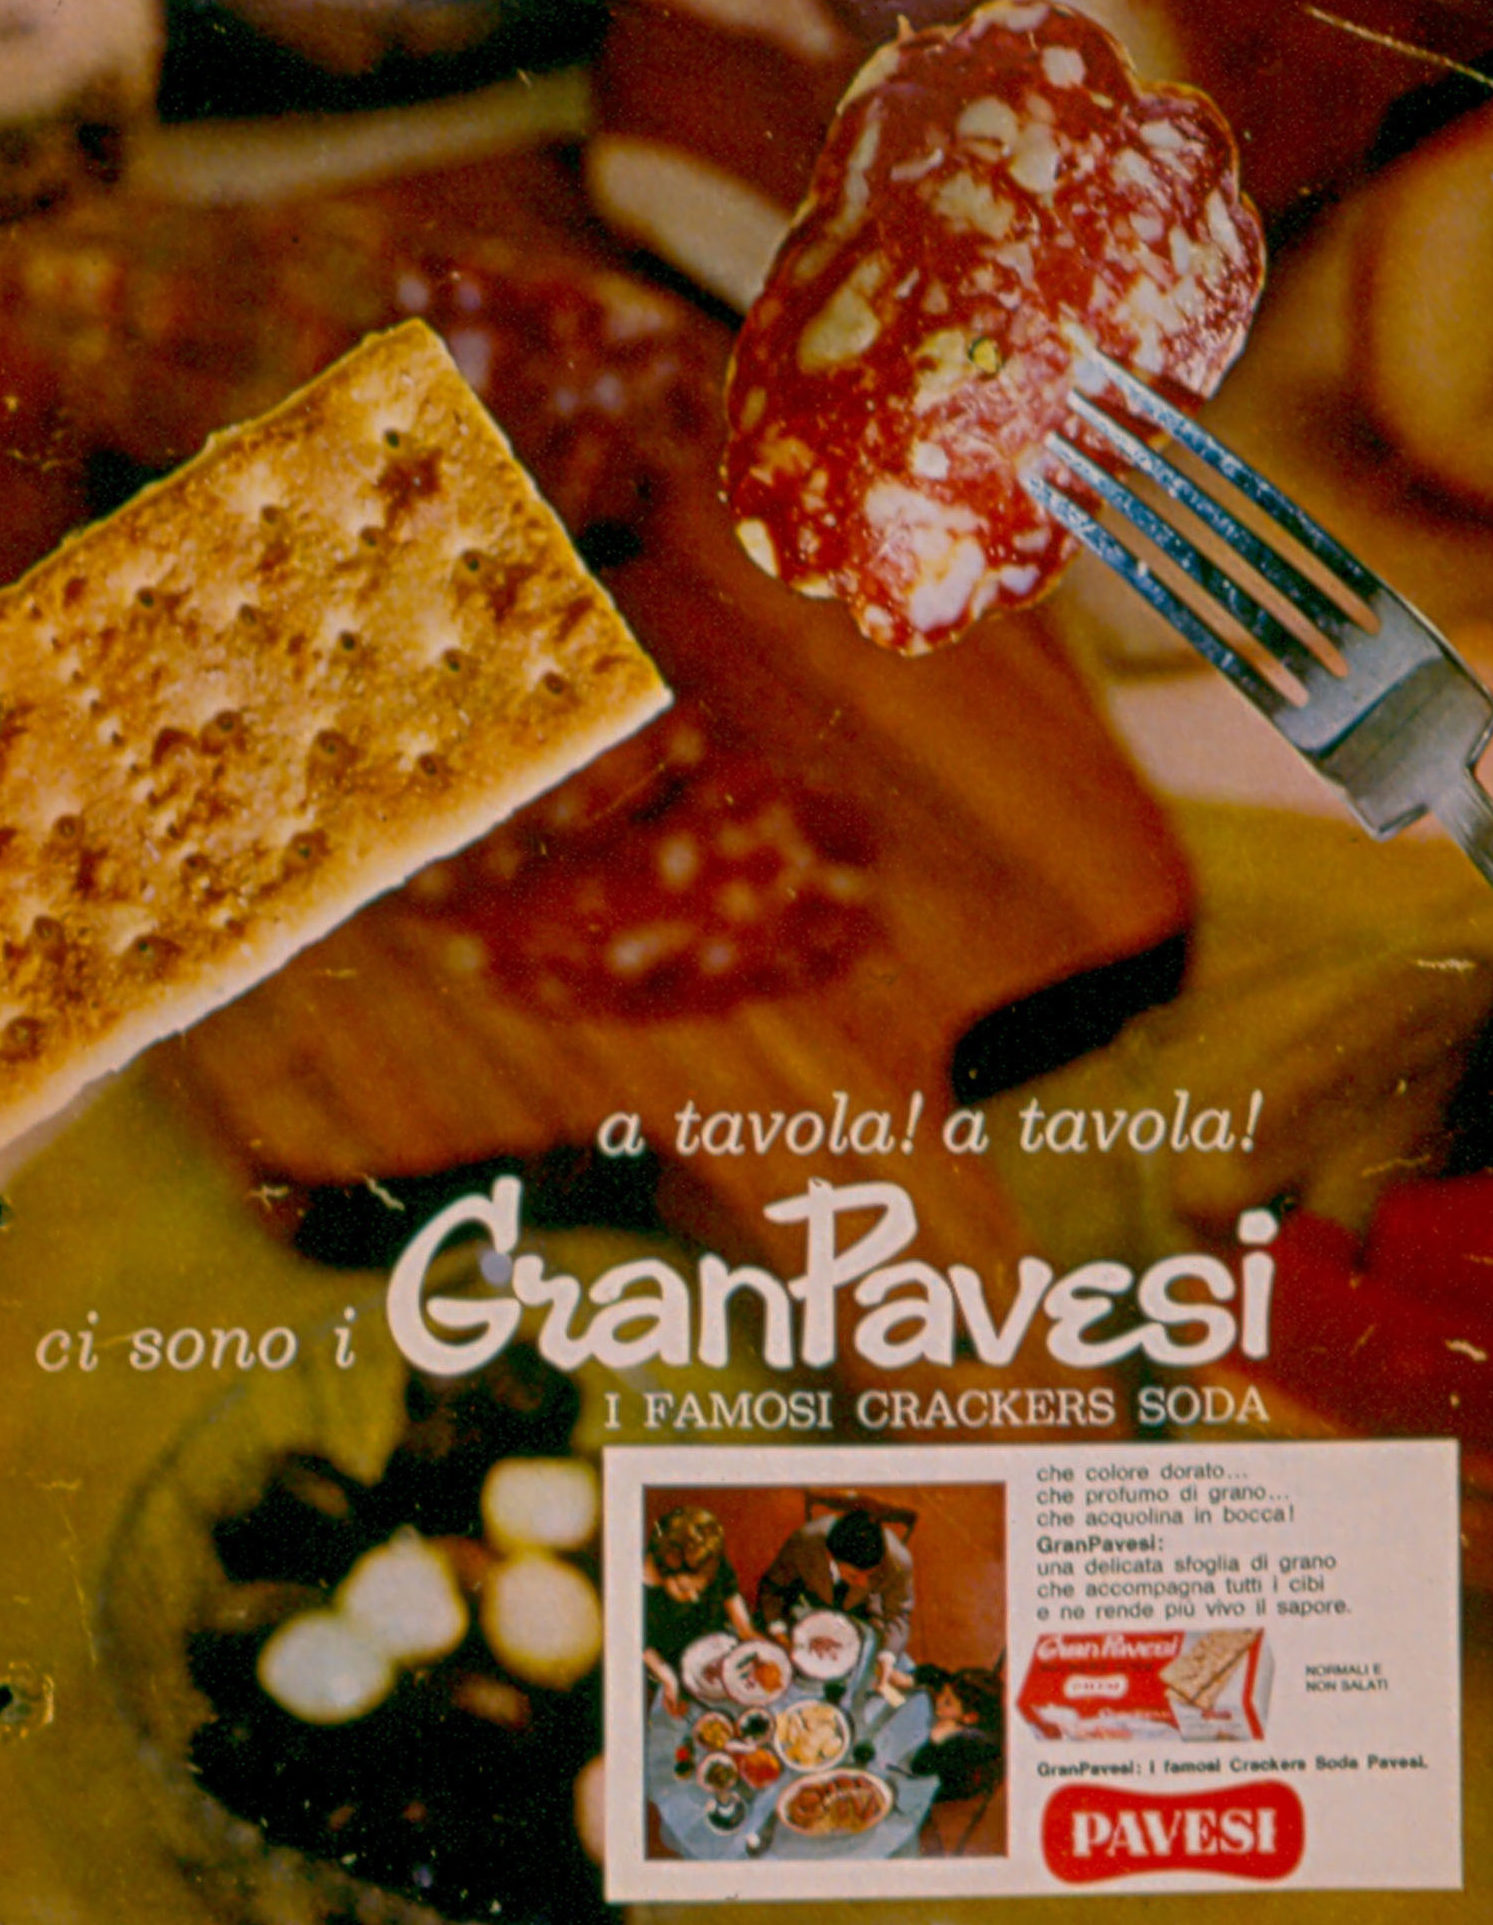 Pubblicità stampa Crakers Gran Pavesi, 1964